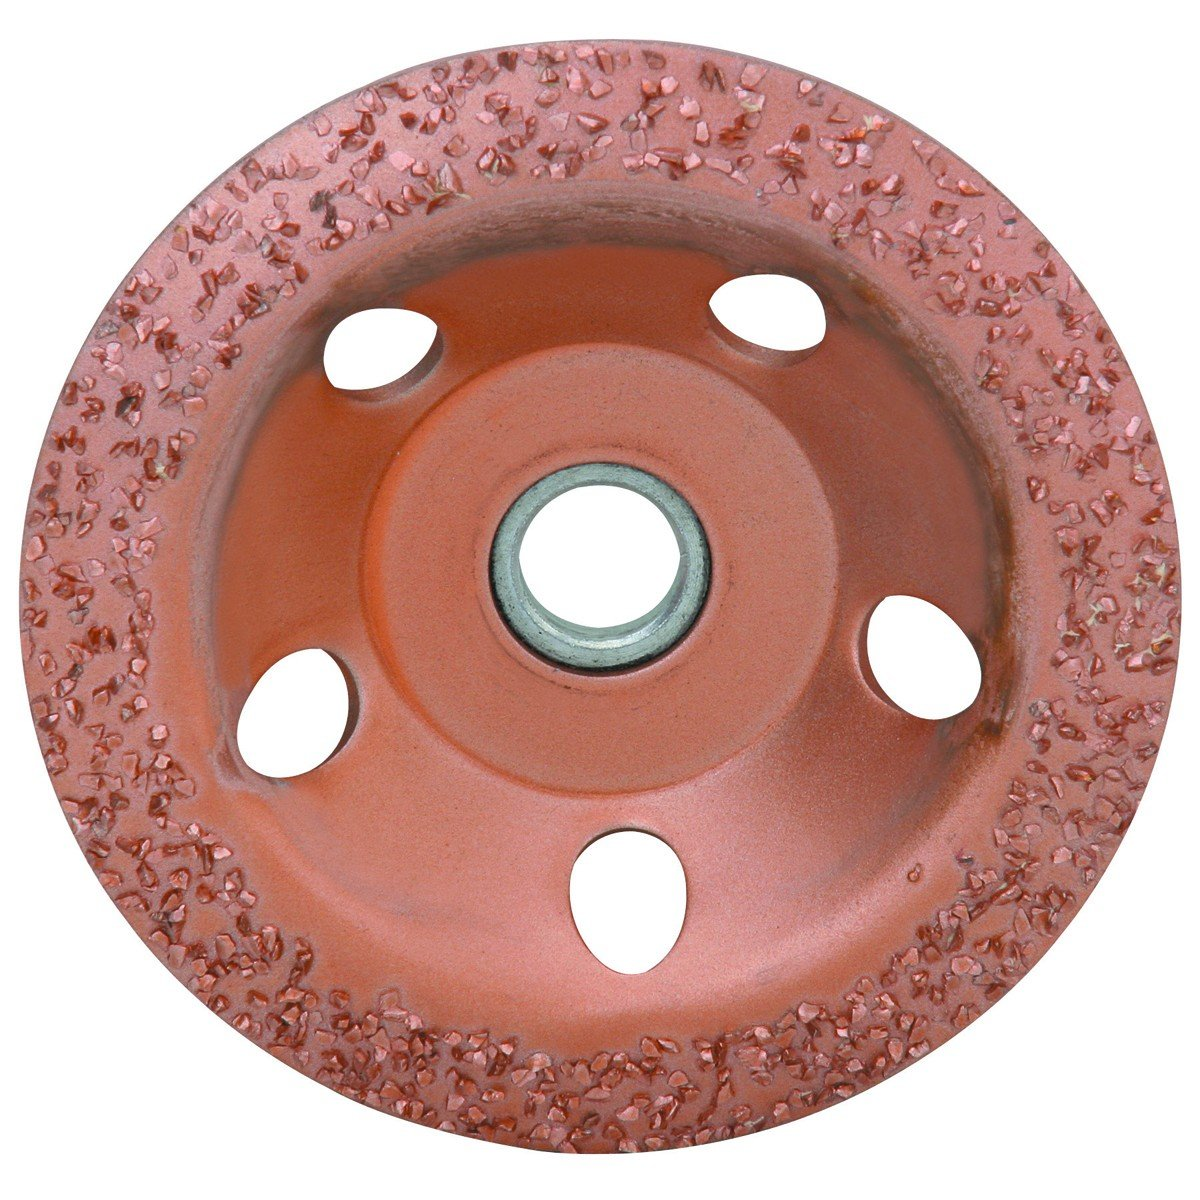 diamondLife 666138 66613 4 1 2 in. 24 Grit Carbide Cup Wheel